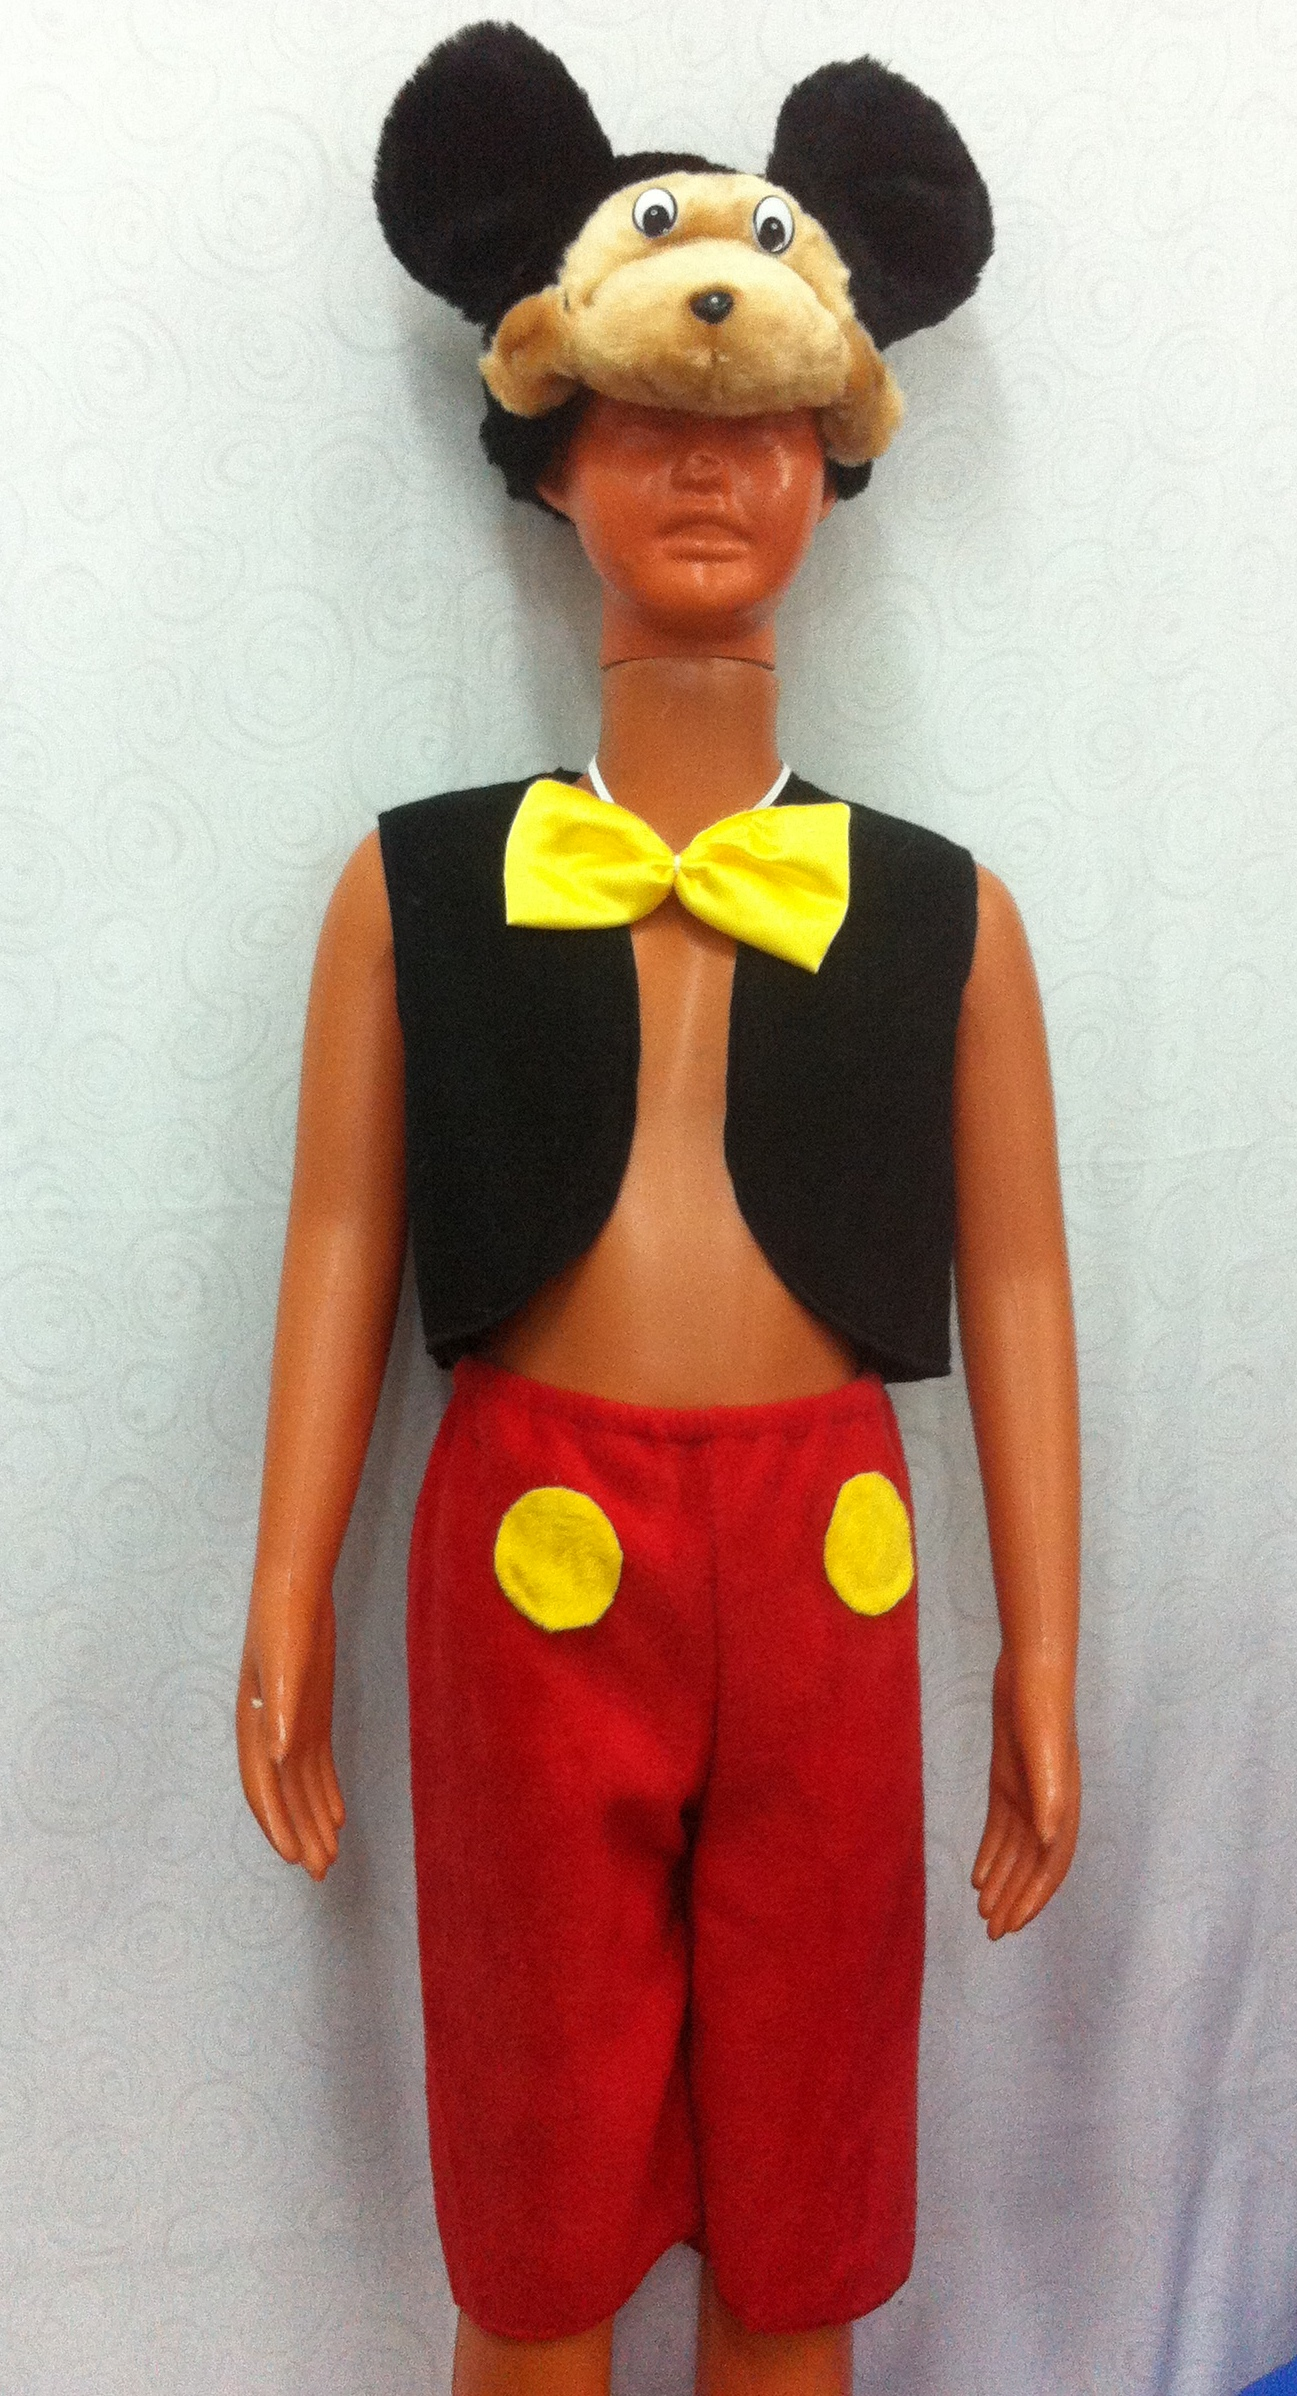 Женский костюм с микки маусом с доставкой